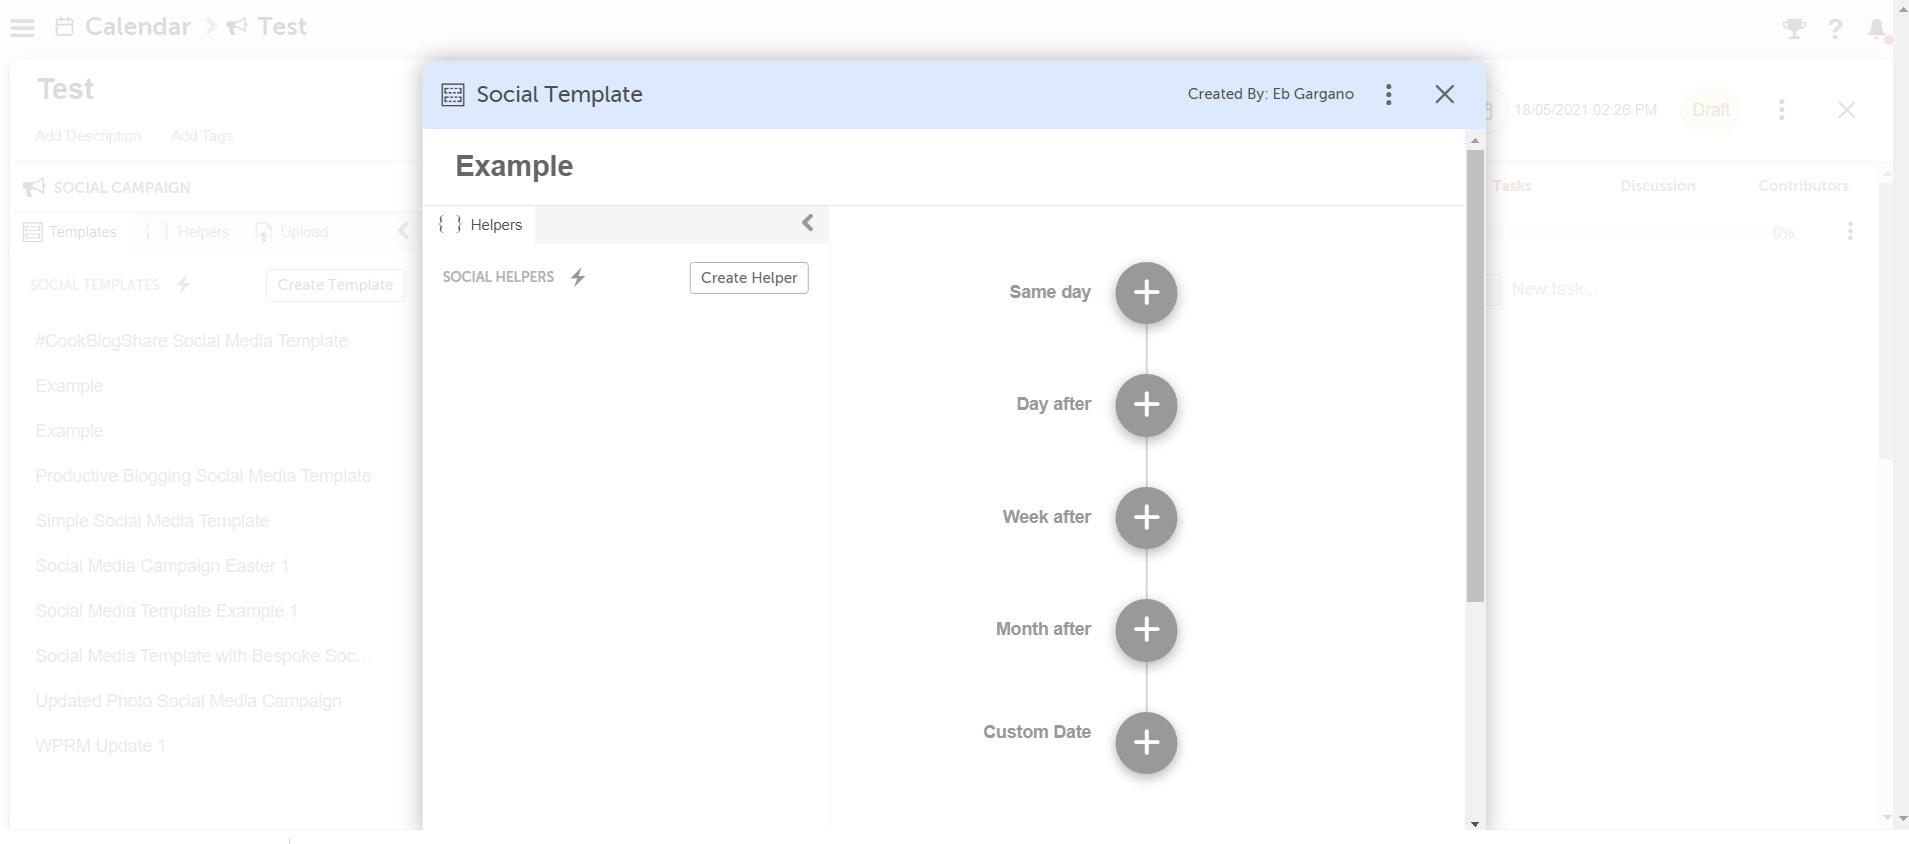 Screengrab of CoSchedule social media template